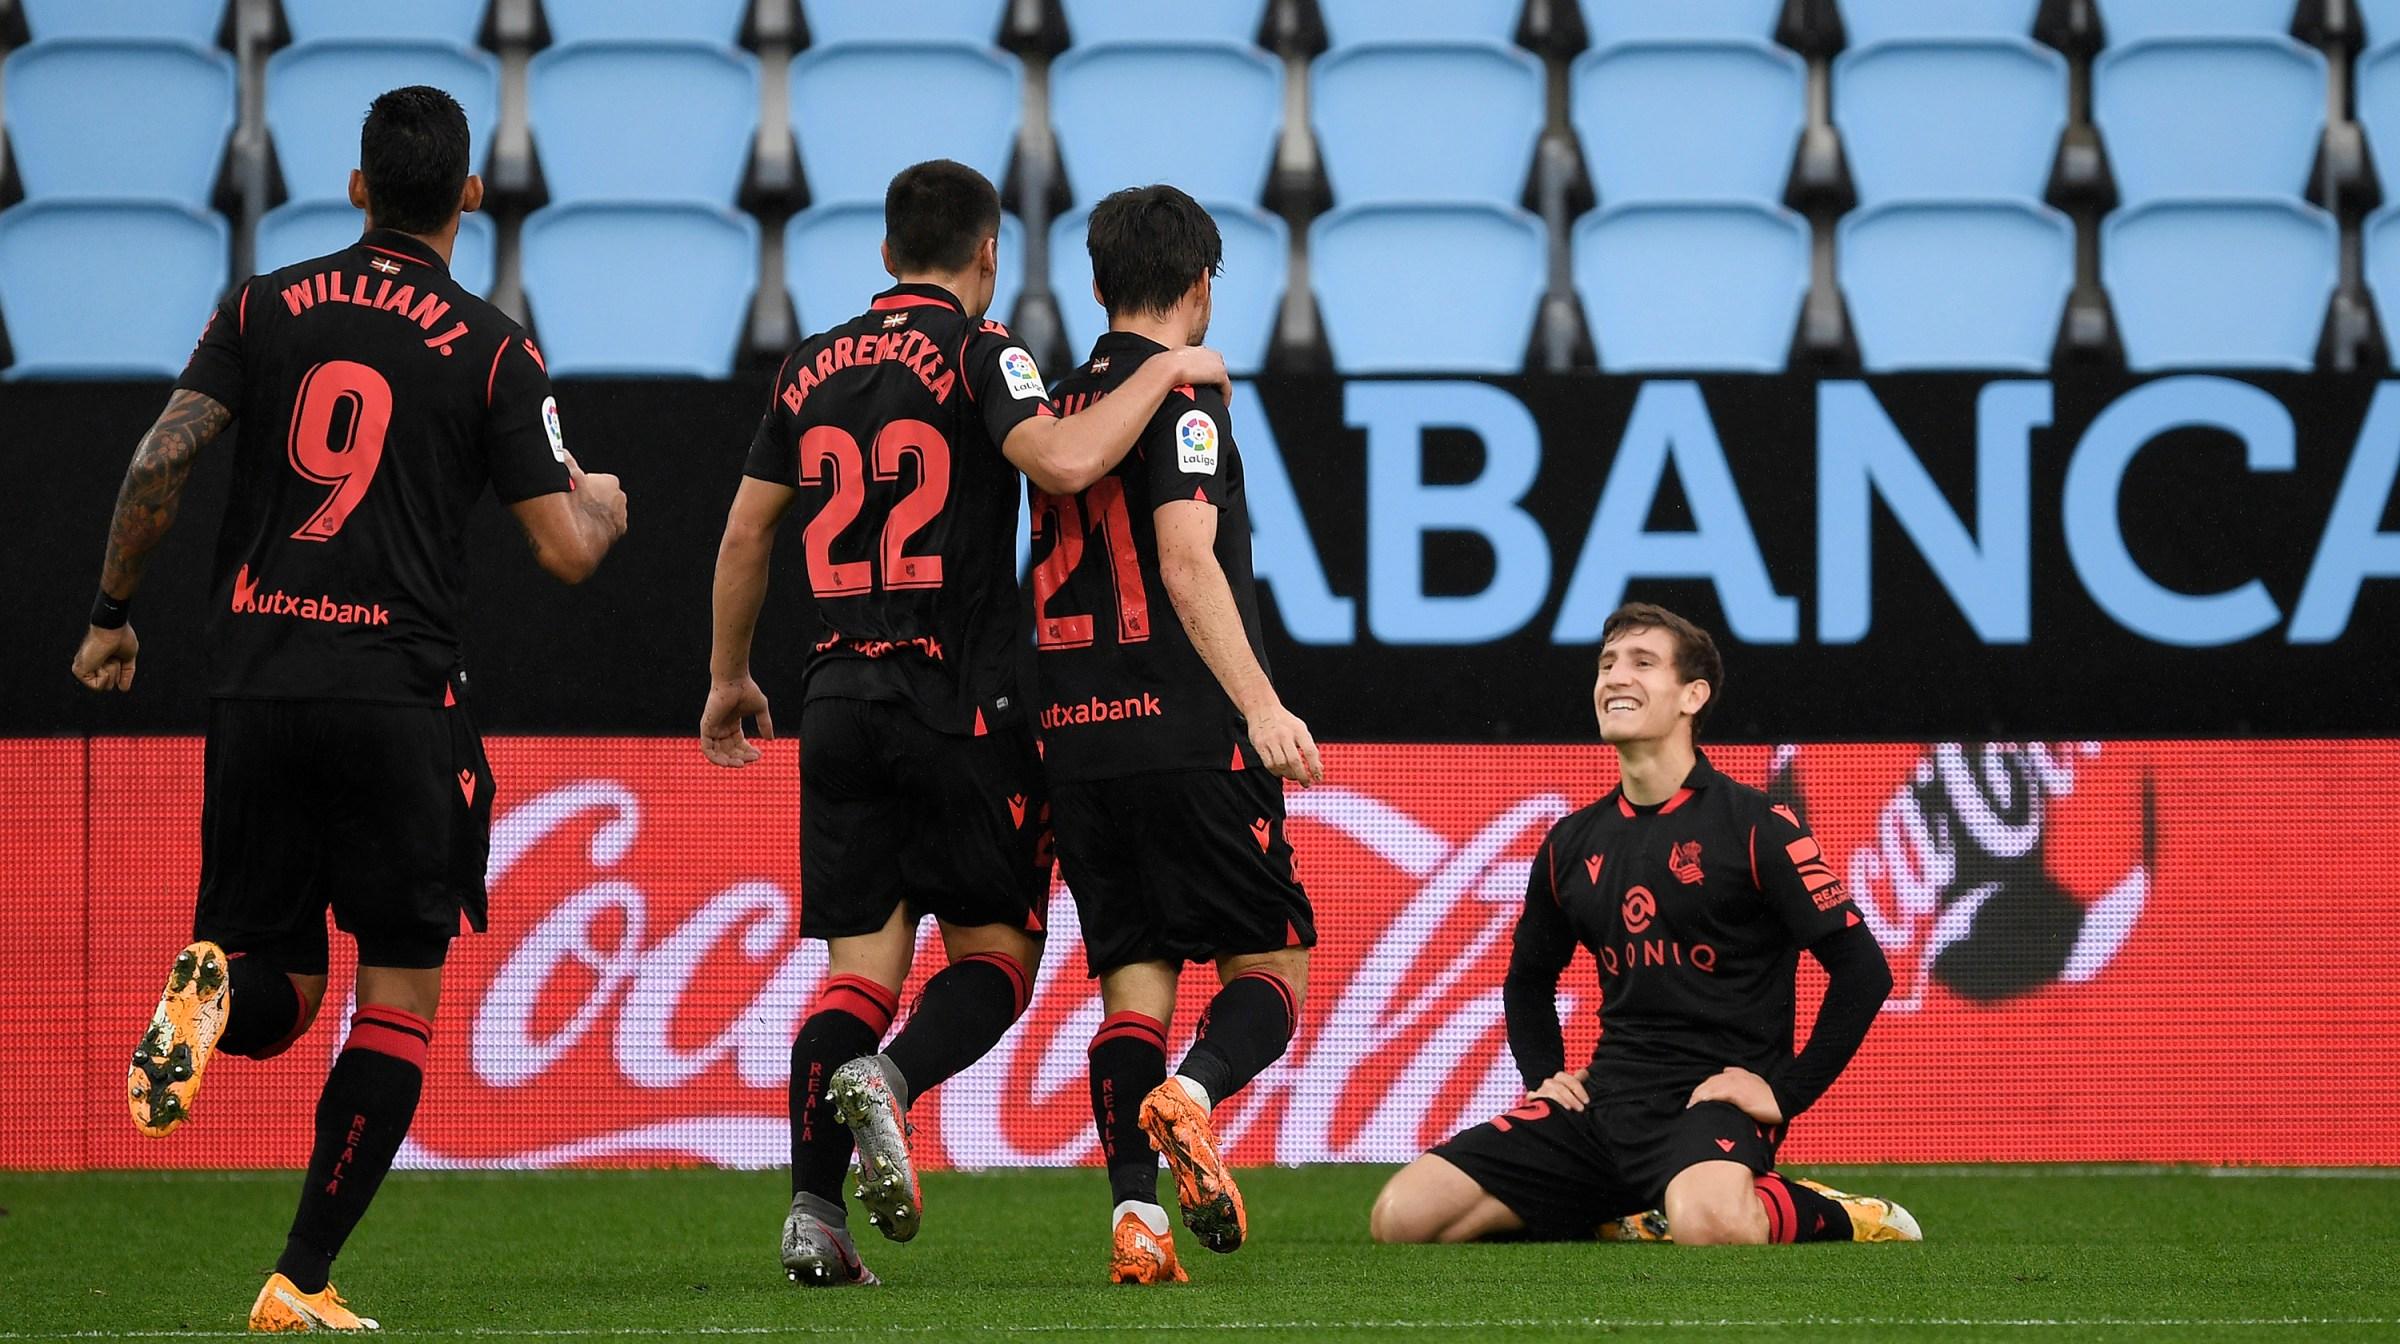 David Silva of Real Sociedad celebrates with teammates after scoring his sides first goal during the La Liga Santader match between RC Celta and Real Sociedad